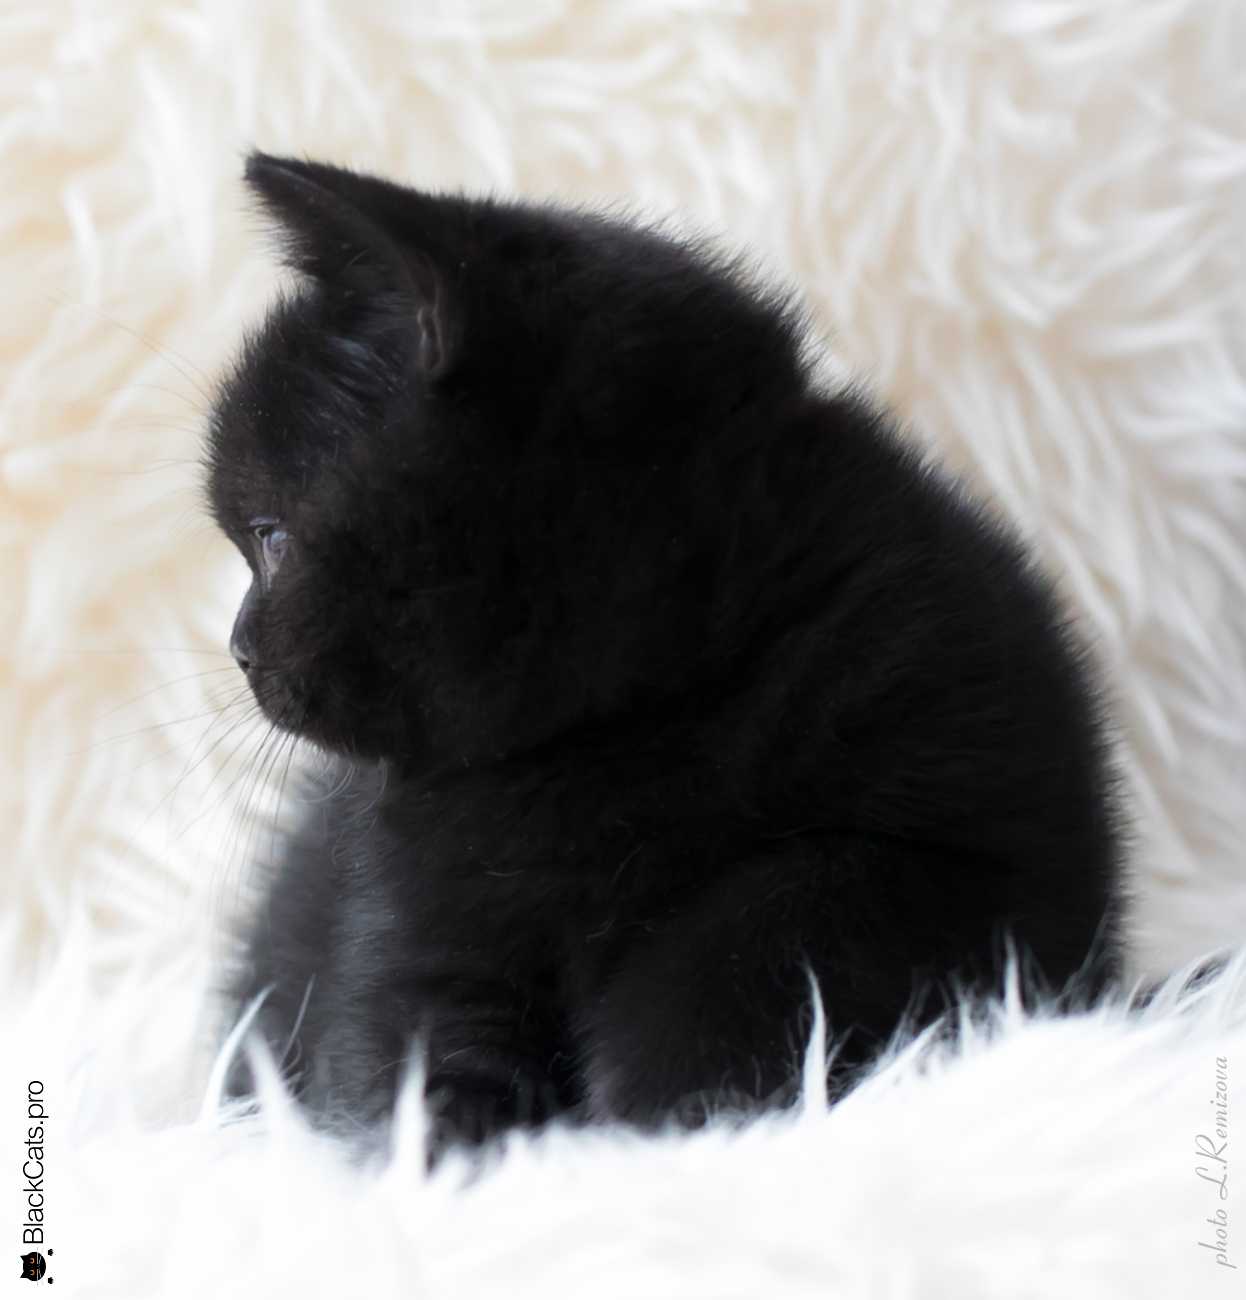 Varvara Black Jetstone 2 months